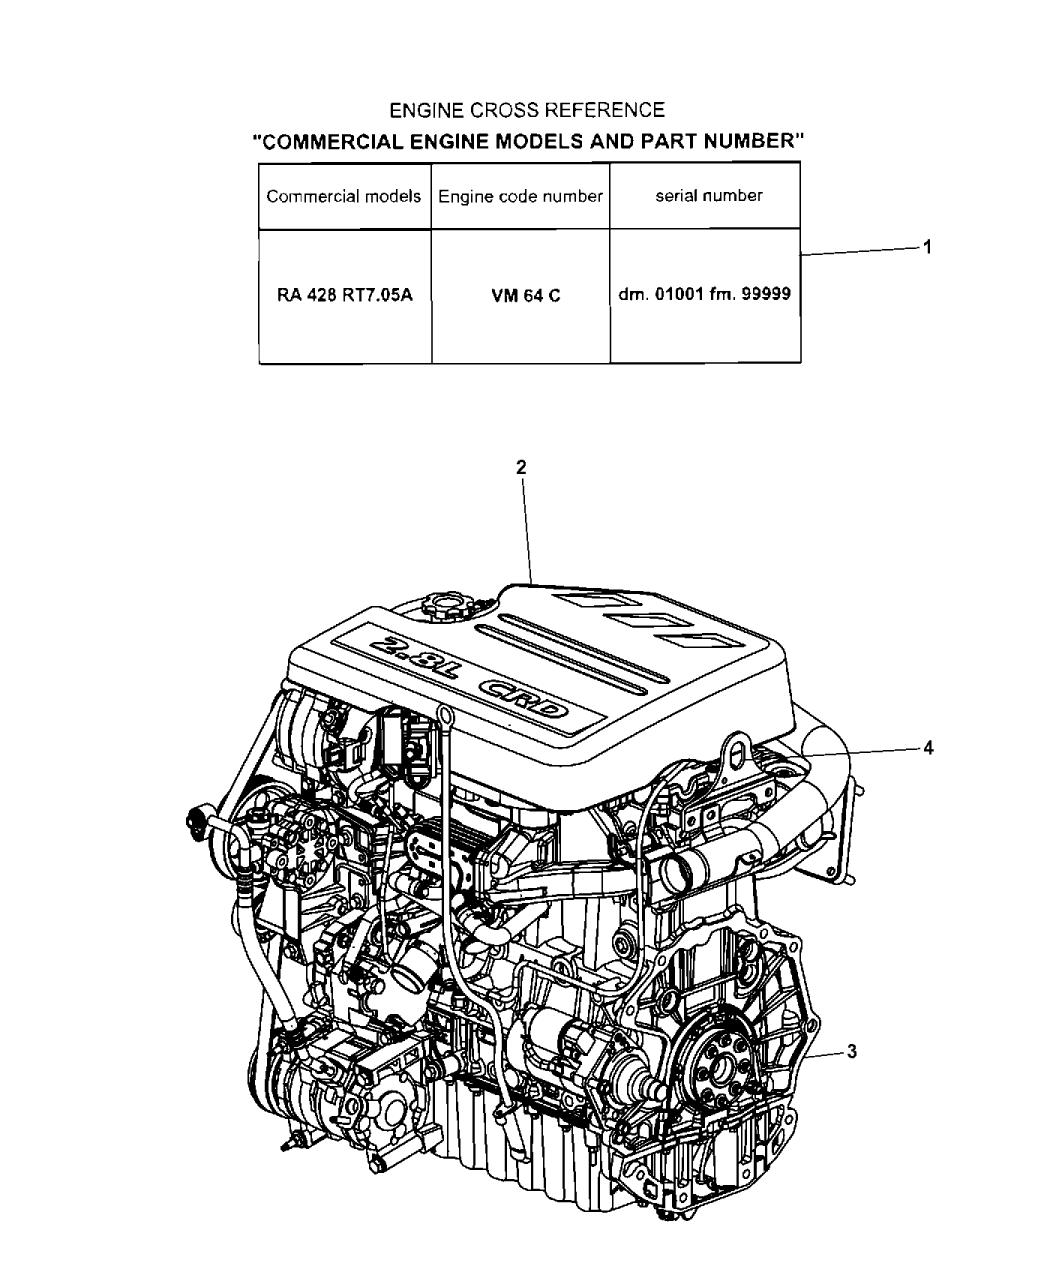 2014 dodge grand caravan engine assembly service